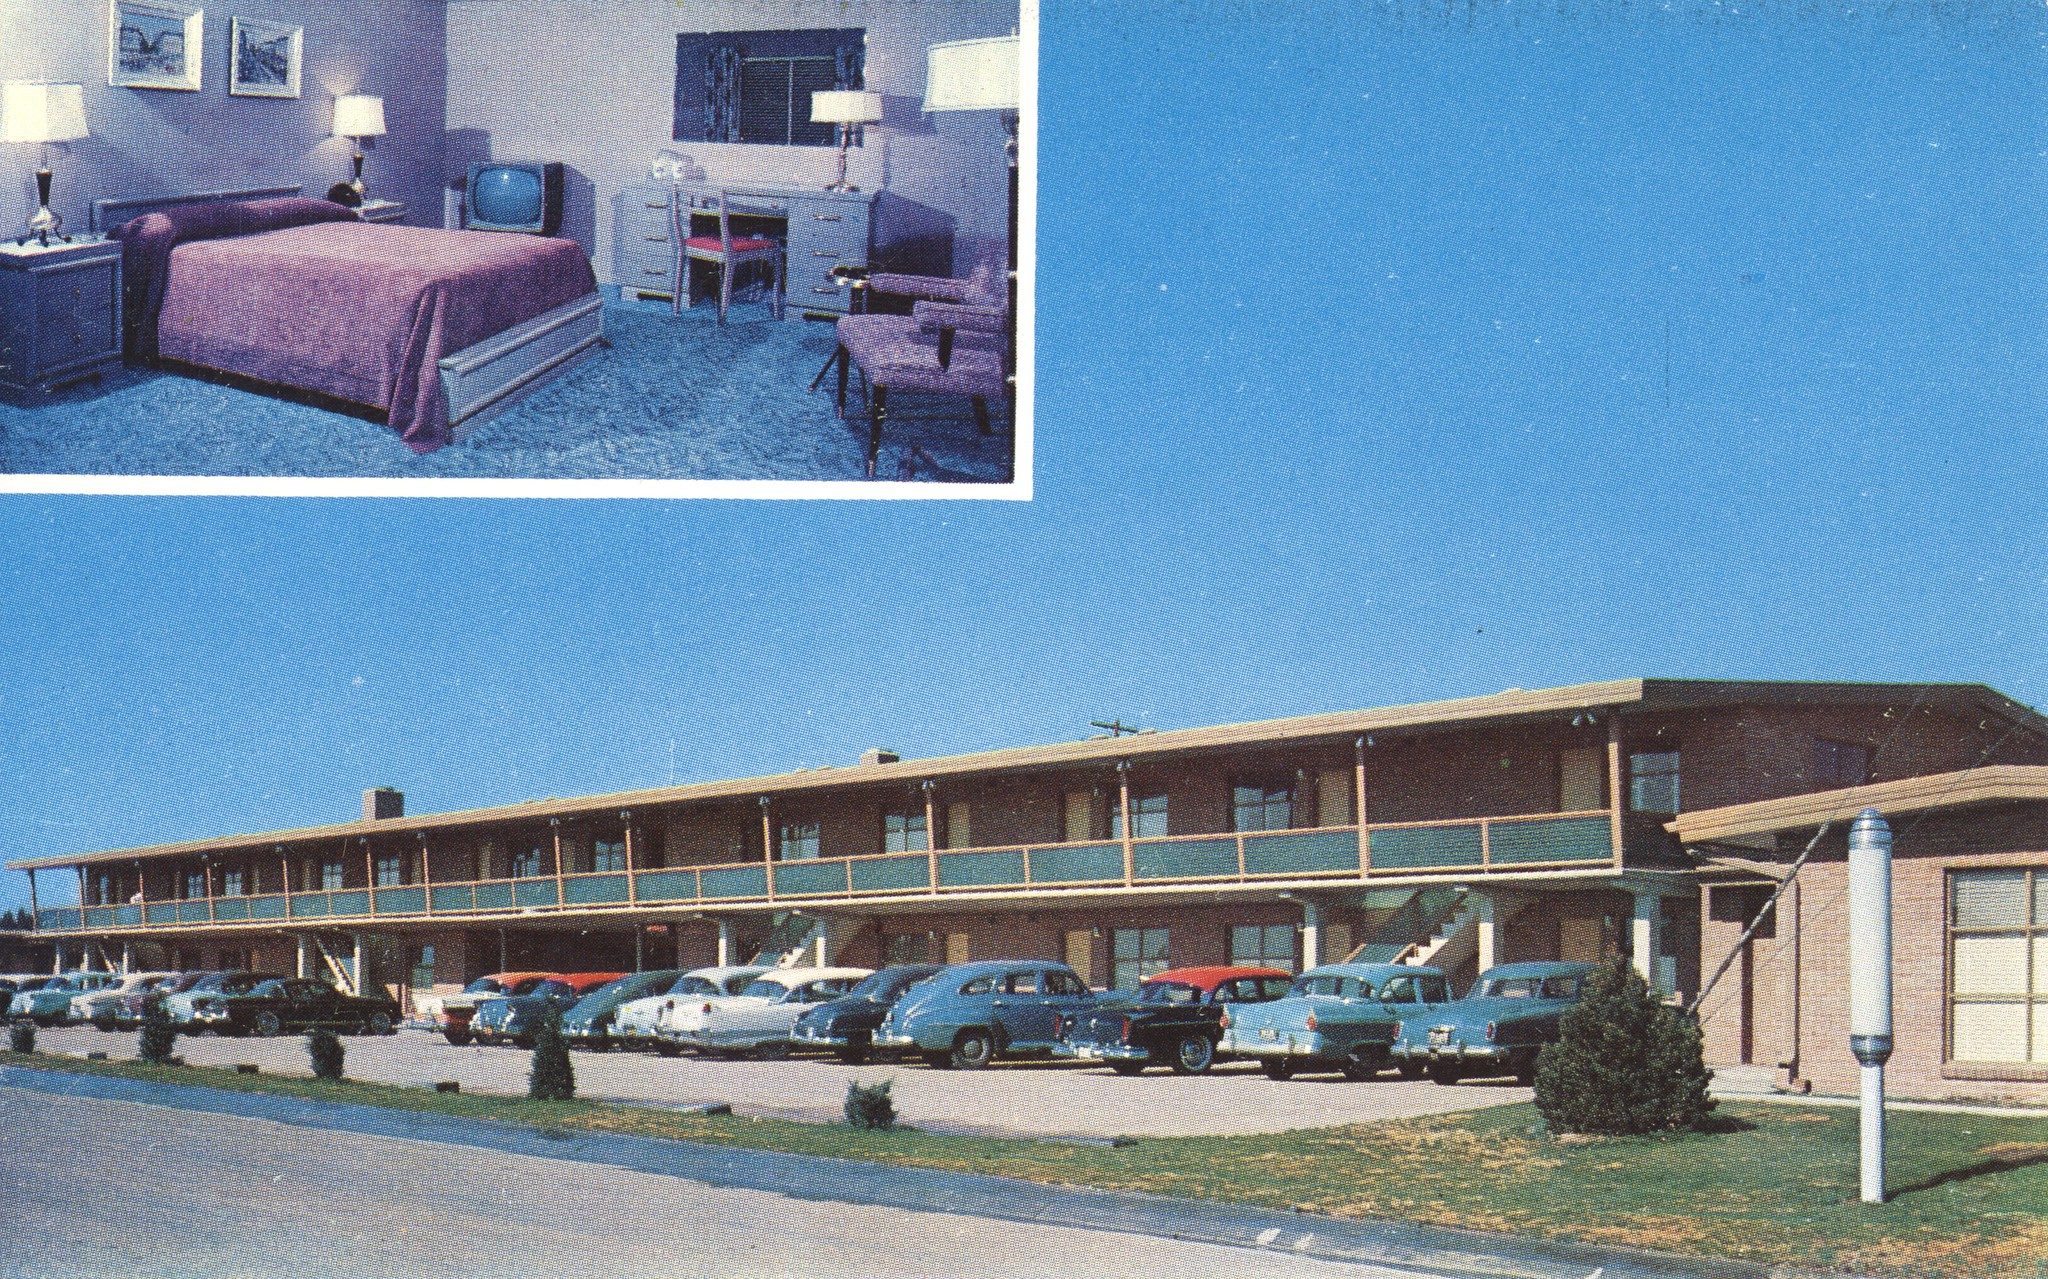 Park Hill Motor Hotel - Denver, Colorado